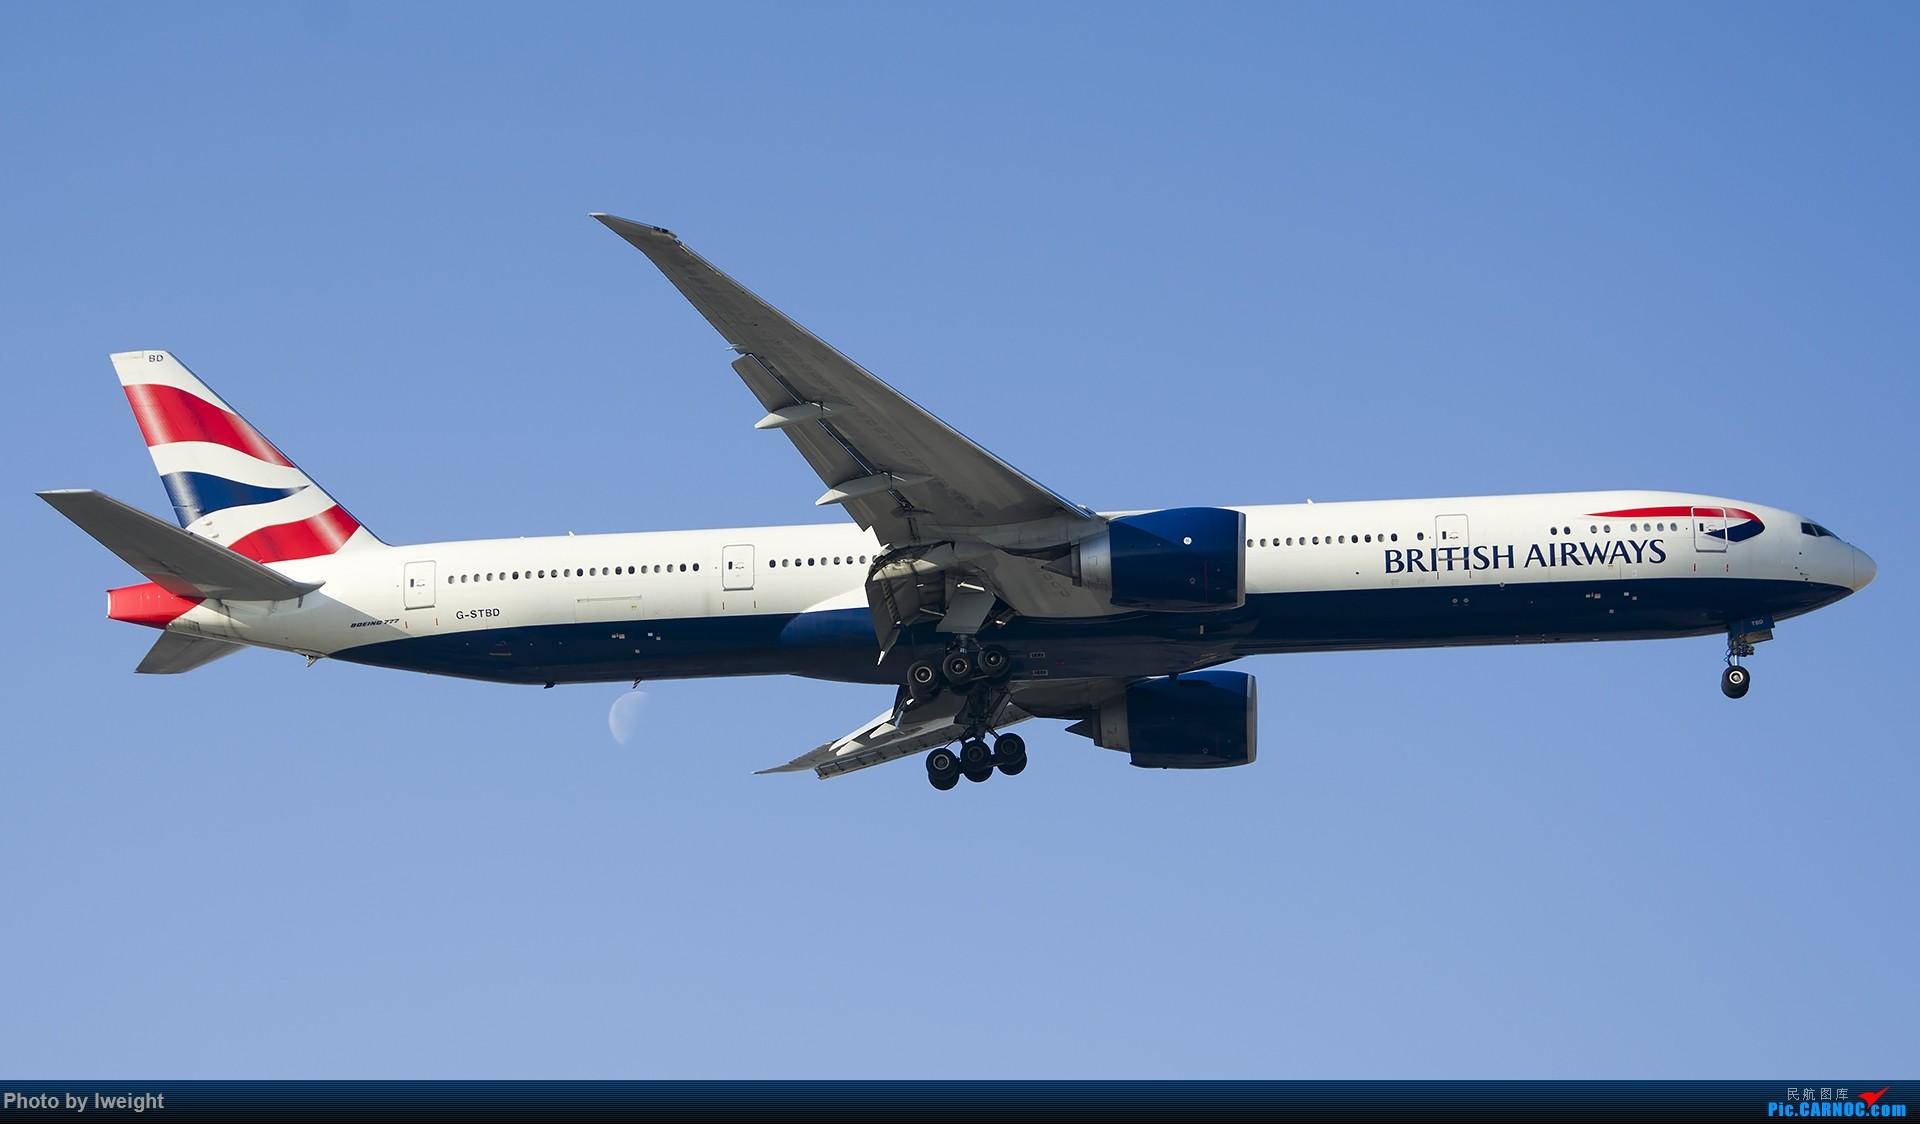 Re:[原创]庆祝升级777,发上今天在首都机场拍的所有飞机【2014-12-14】 BOEING 777-300ER G-STBD 中国北京首都国际机场